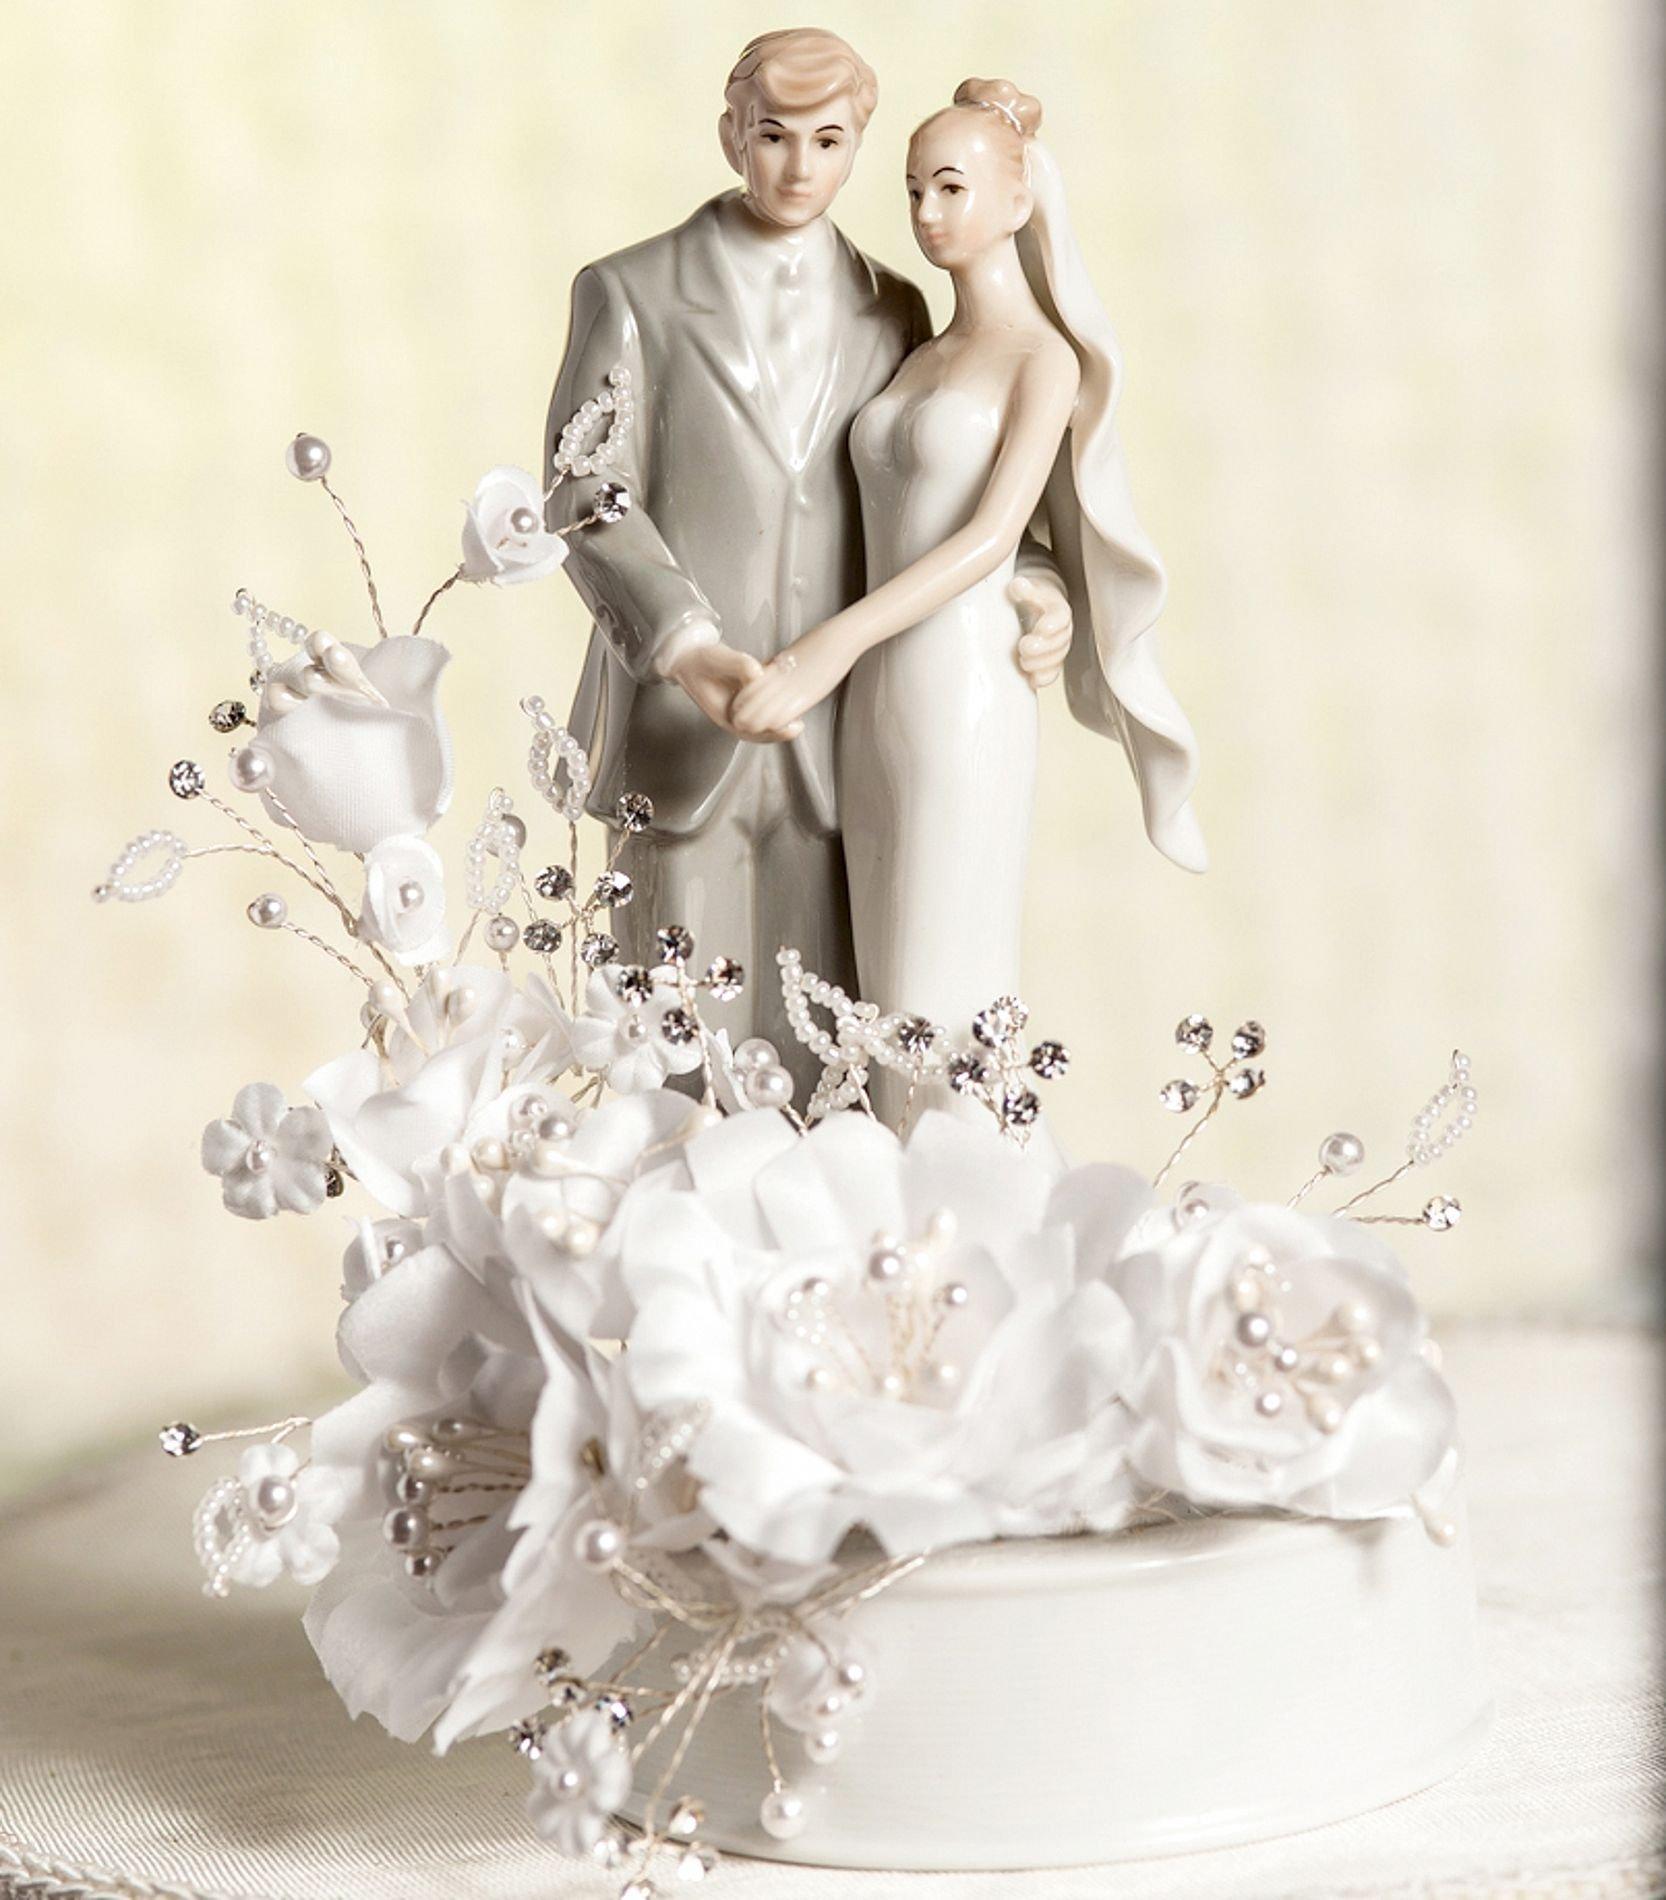 Adored Vintage 10 Vintage Inspired Wedding Cakes: Vintage Bride And Groom Wedding Cake Topper